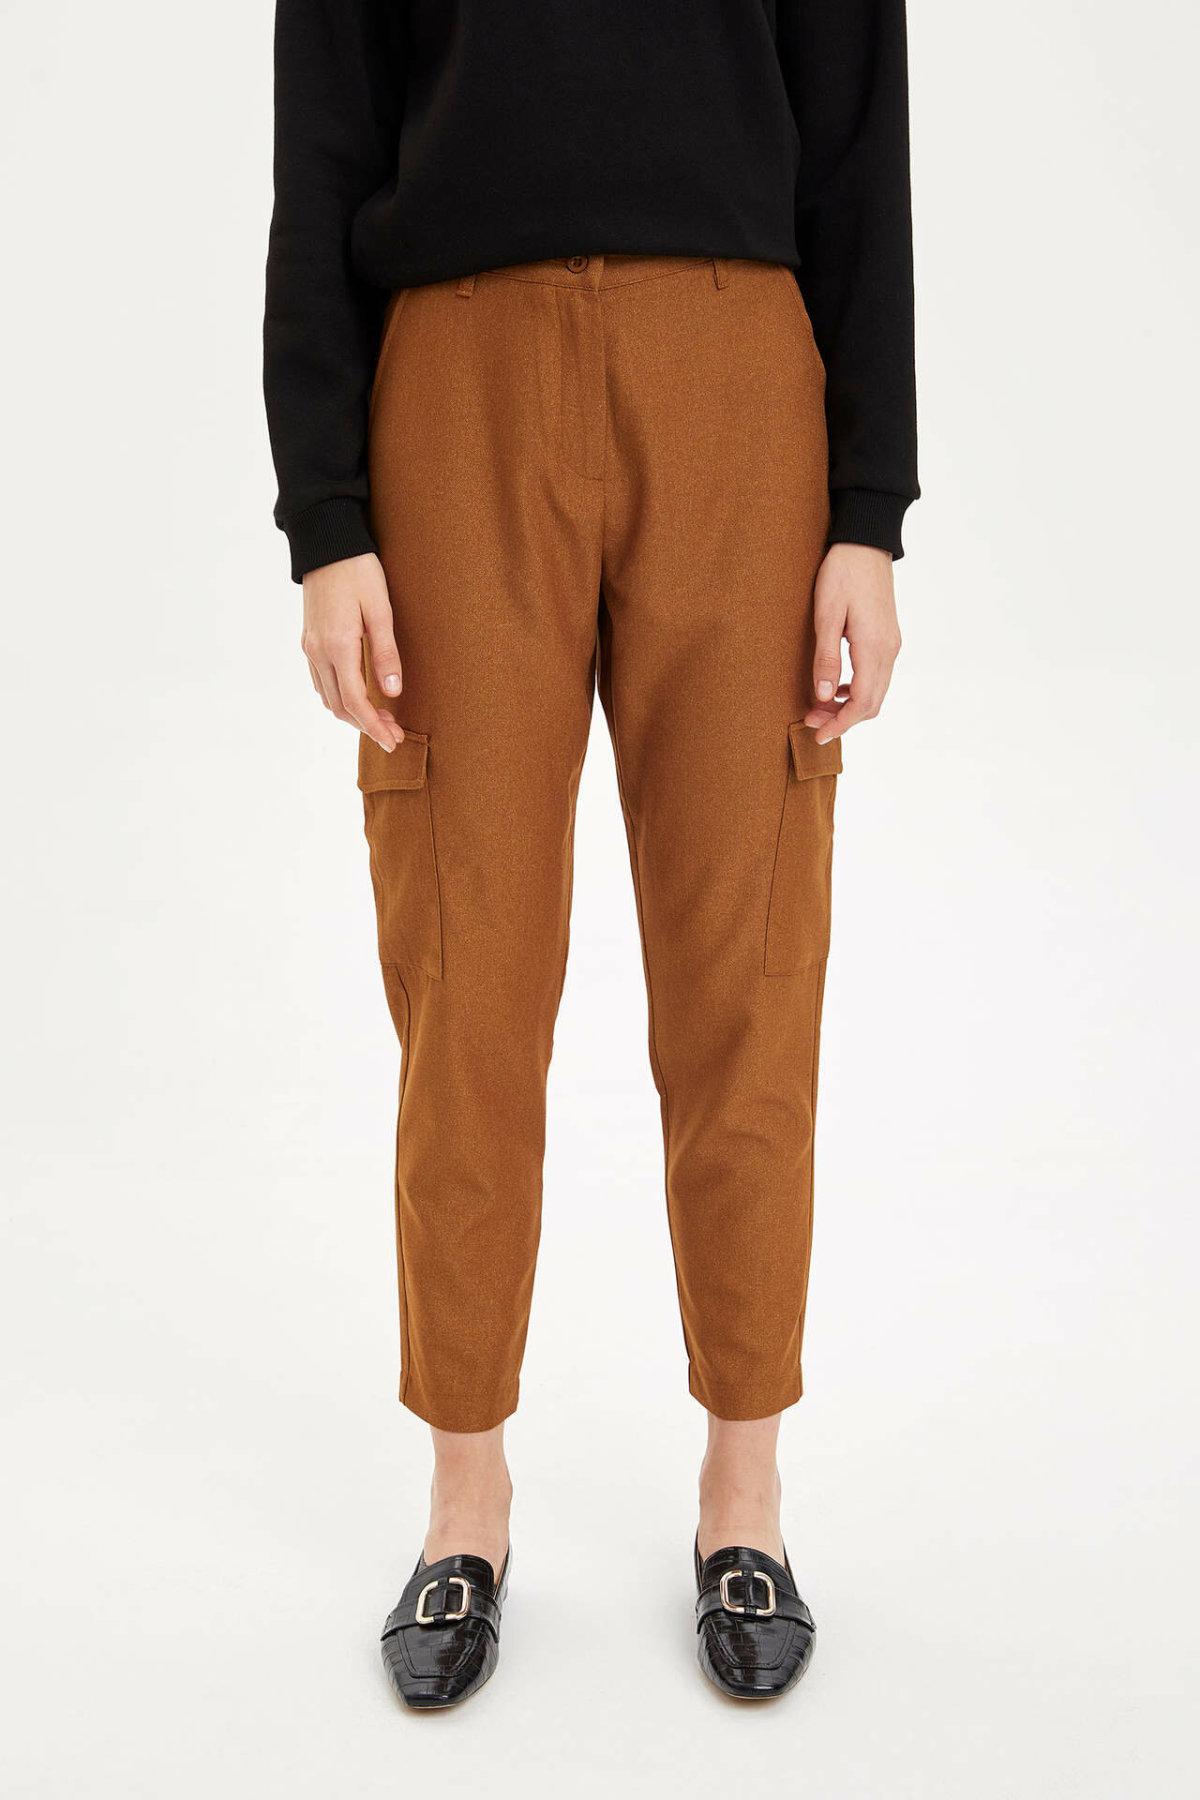 DeFacto Woman Winter Cargo Pants Women Poackets Decors Long Pants Female Black Skinny Bottoms Trousers-M8825AZ19WN